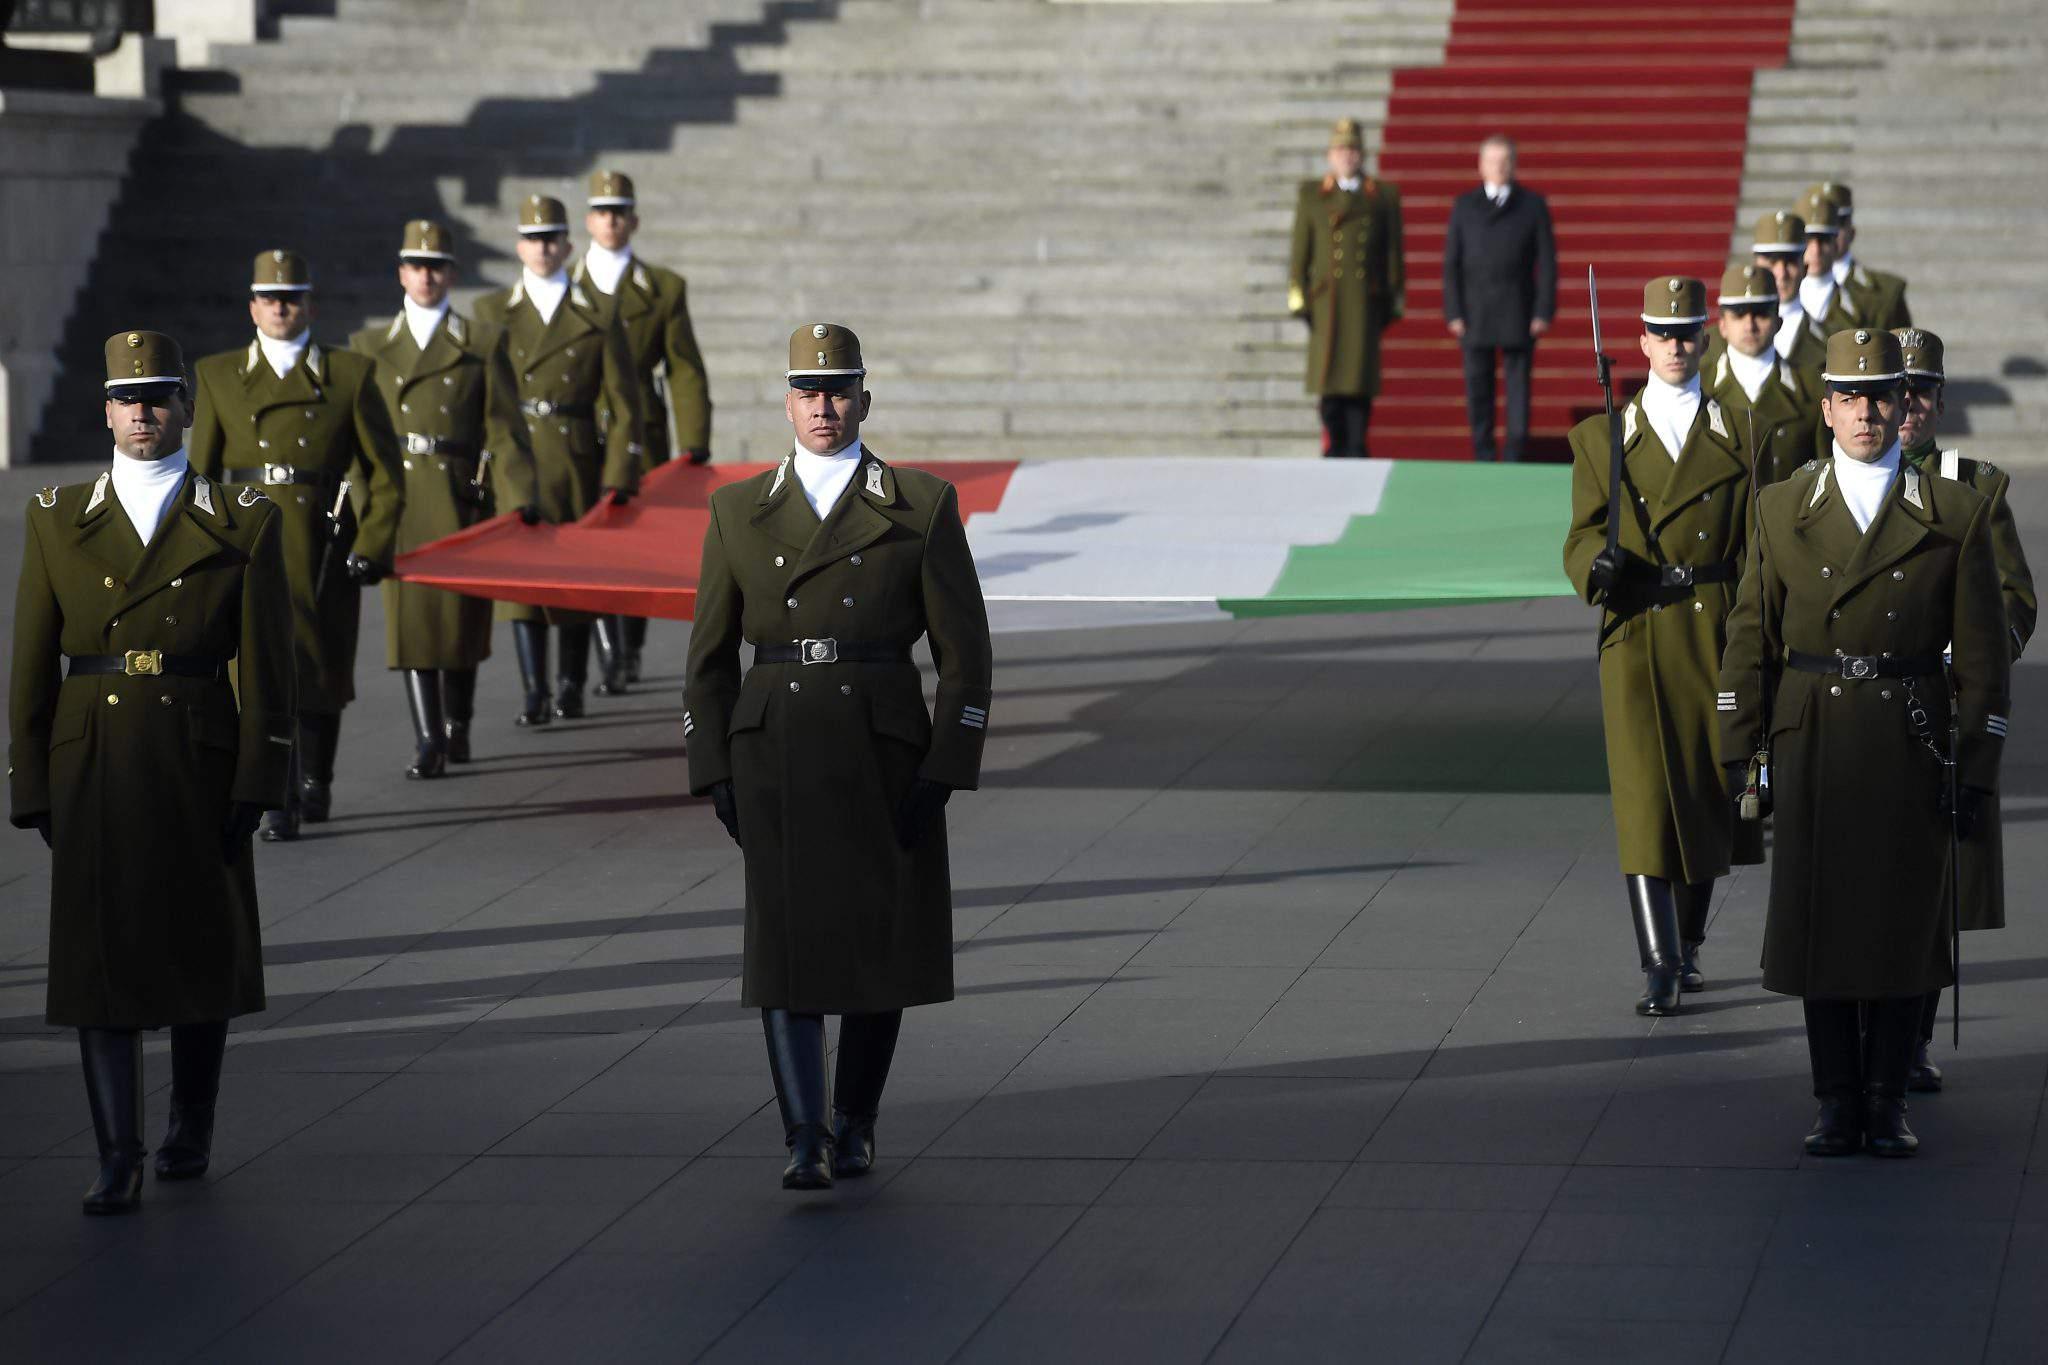 Kossuth Square, Budapest - Hungary marks anniversary of 1956 Soviet reprisal